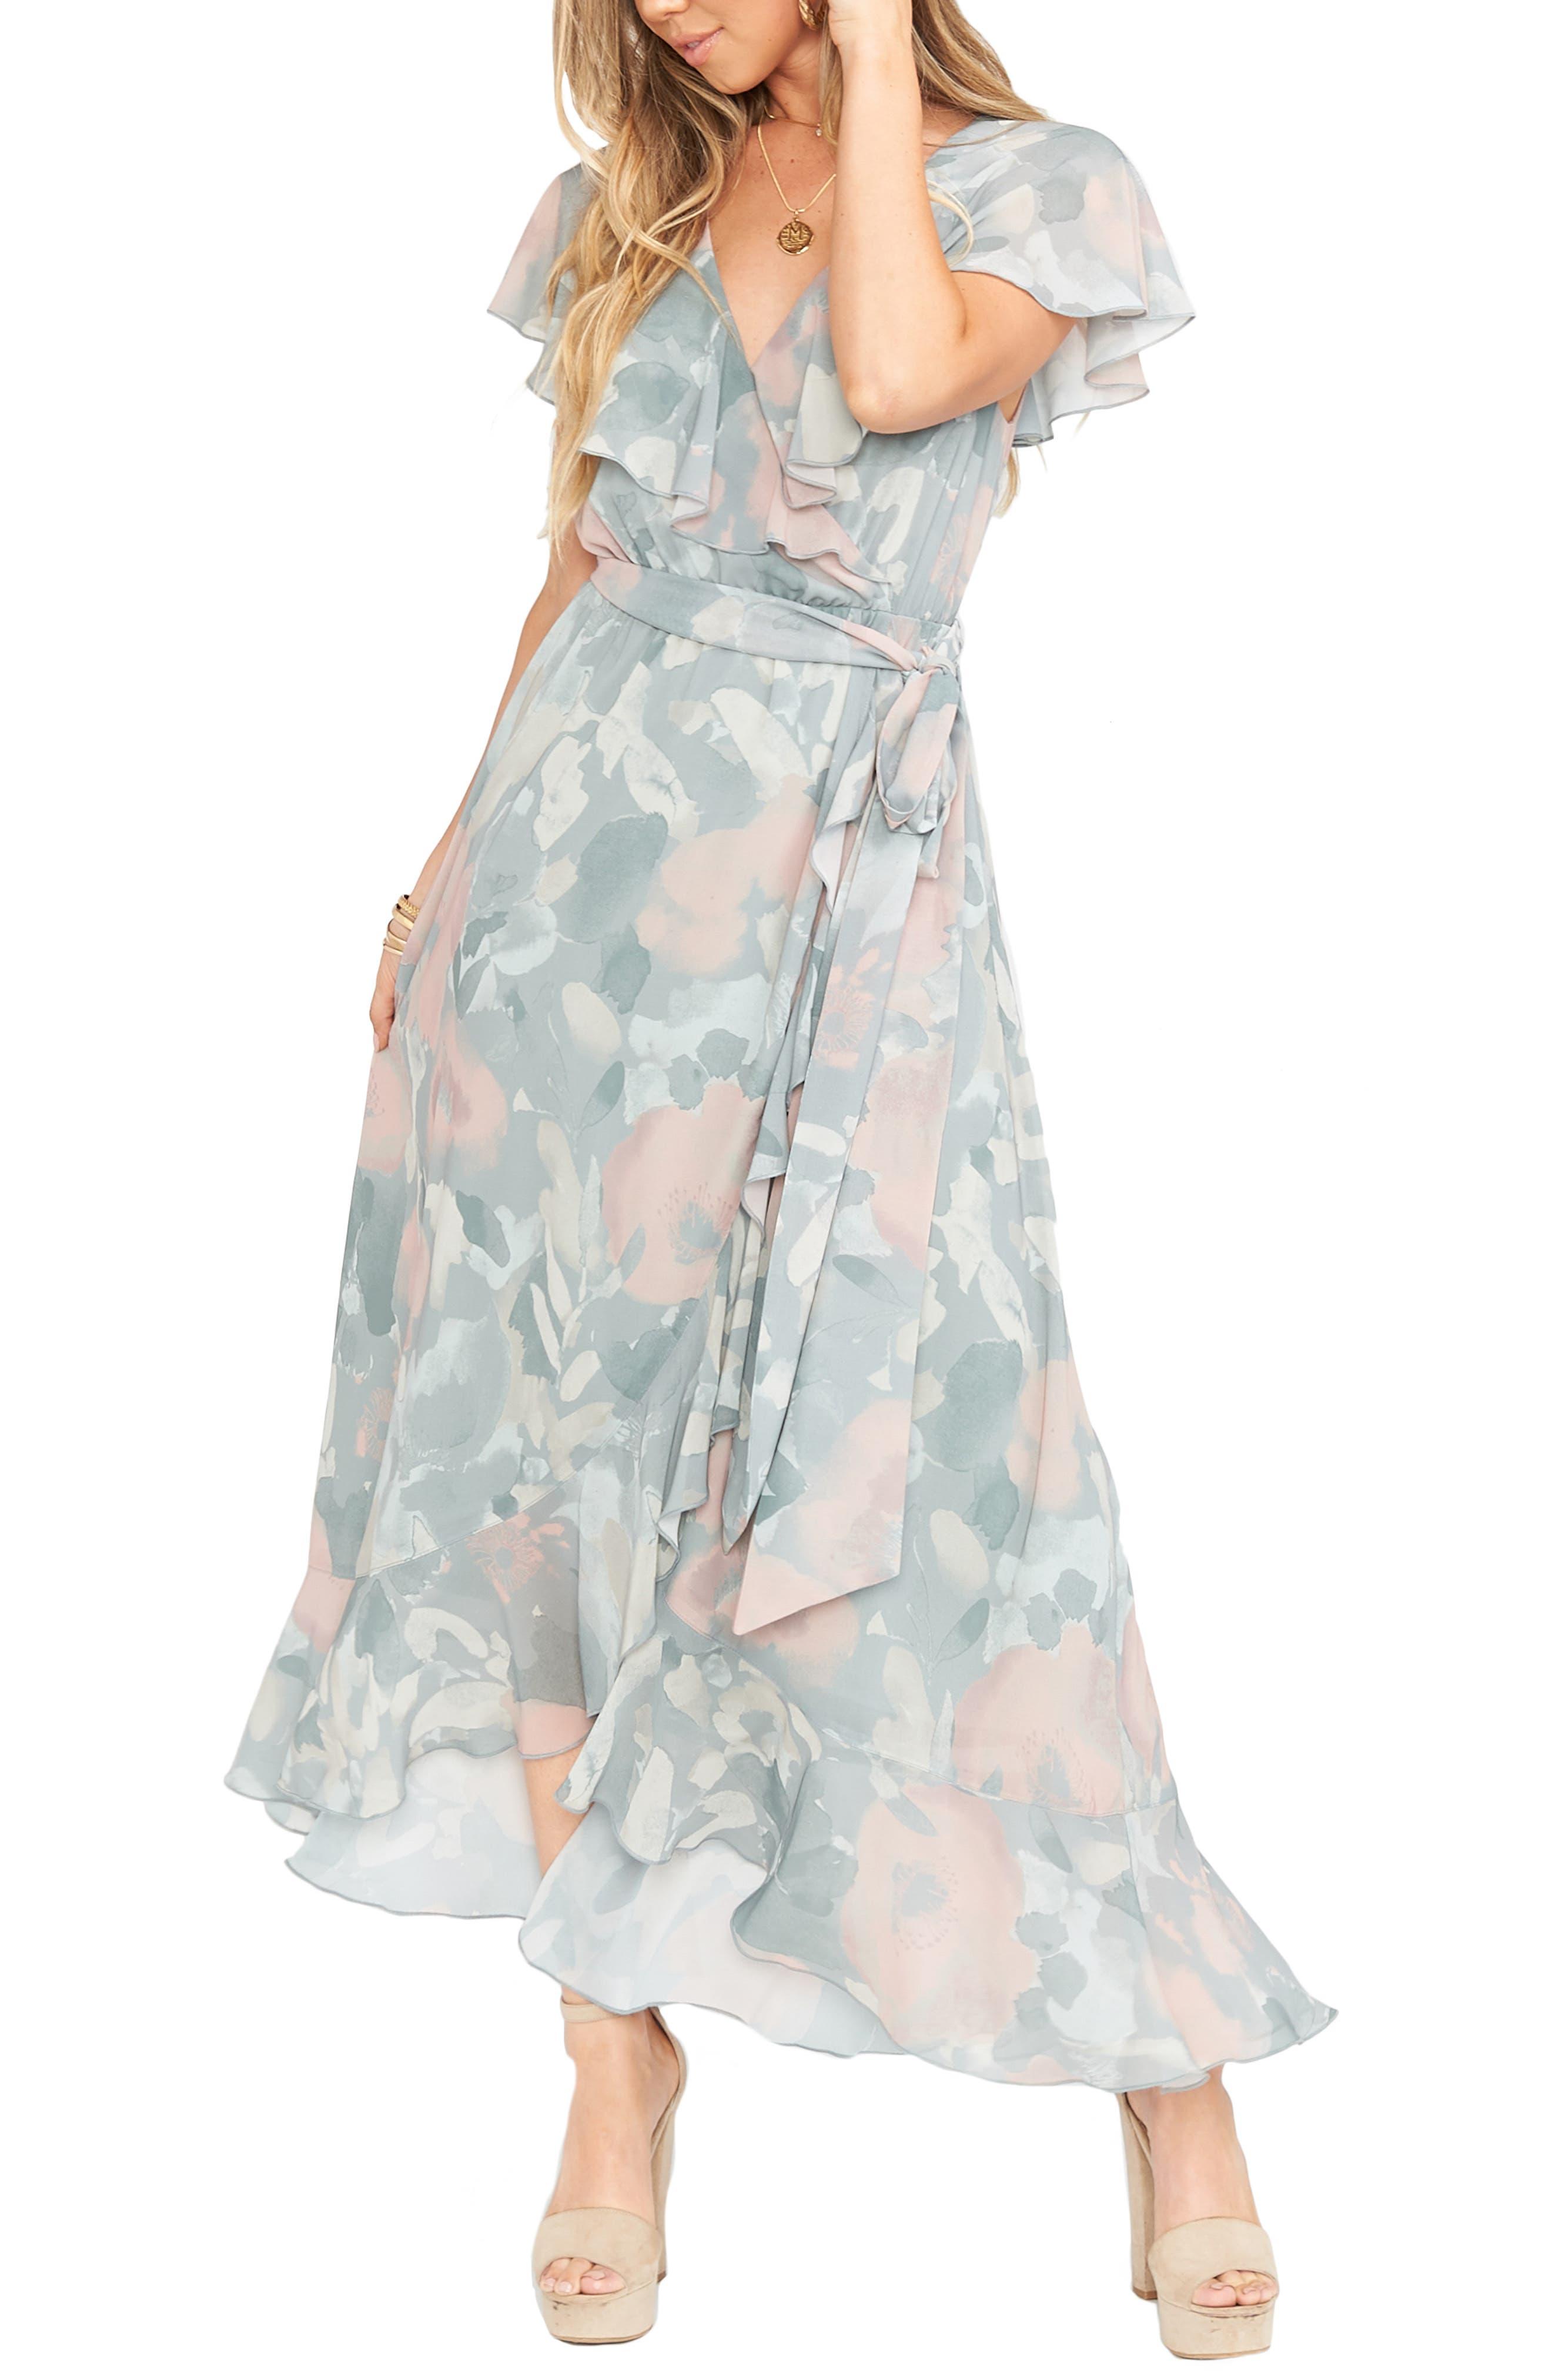 Vintage Bridesmaid Dress Ideas by Decade Womens Show Me Your Mumu Jess Ruffle Maxi Dress Size XX-Large - Beige $198.00 AT vintagedancer.com